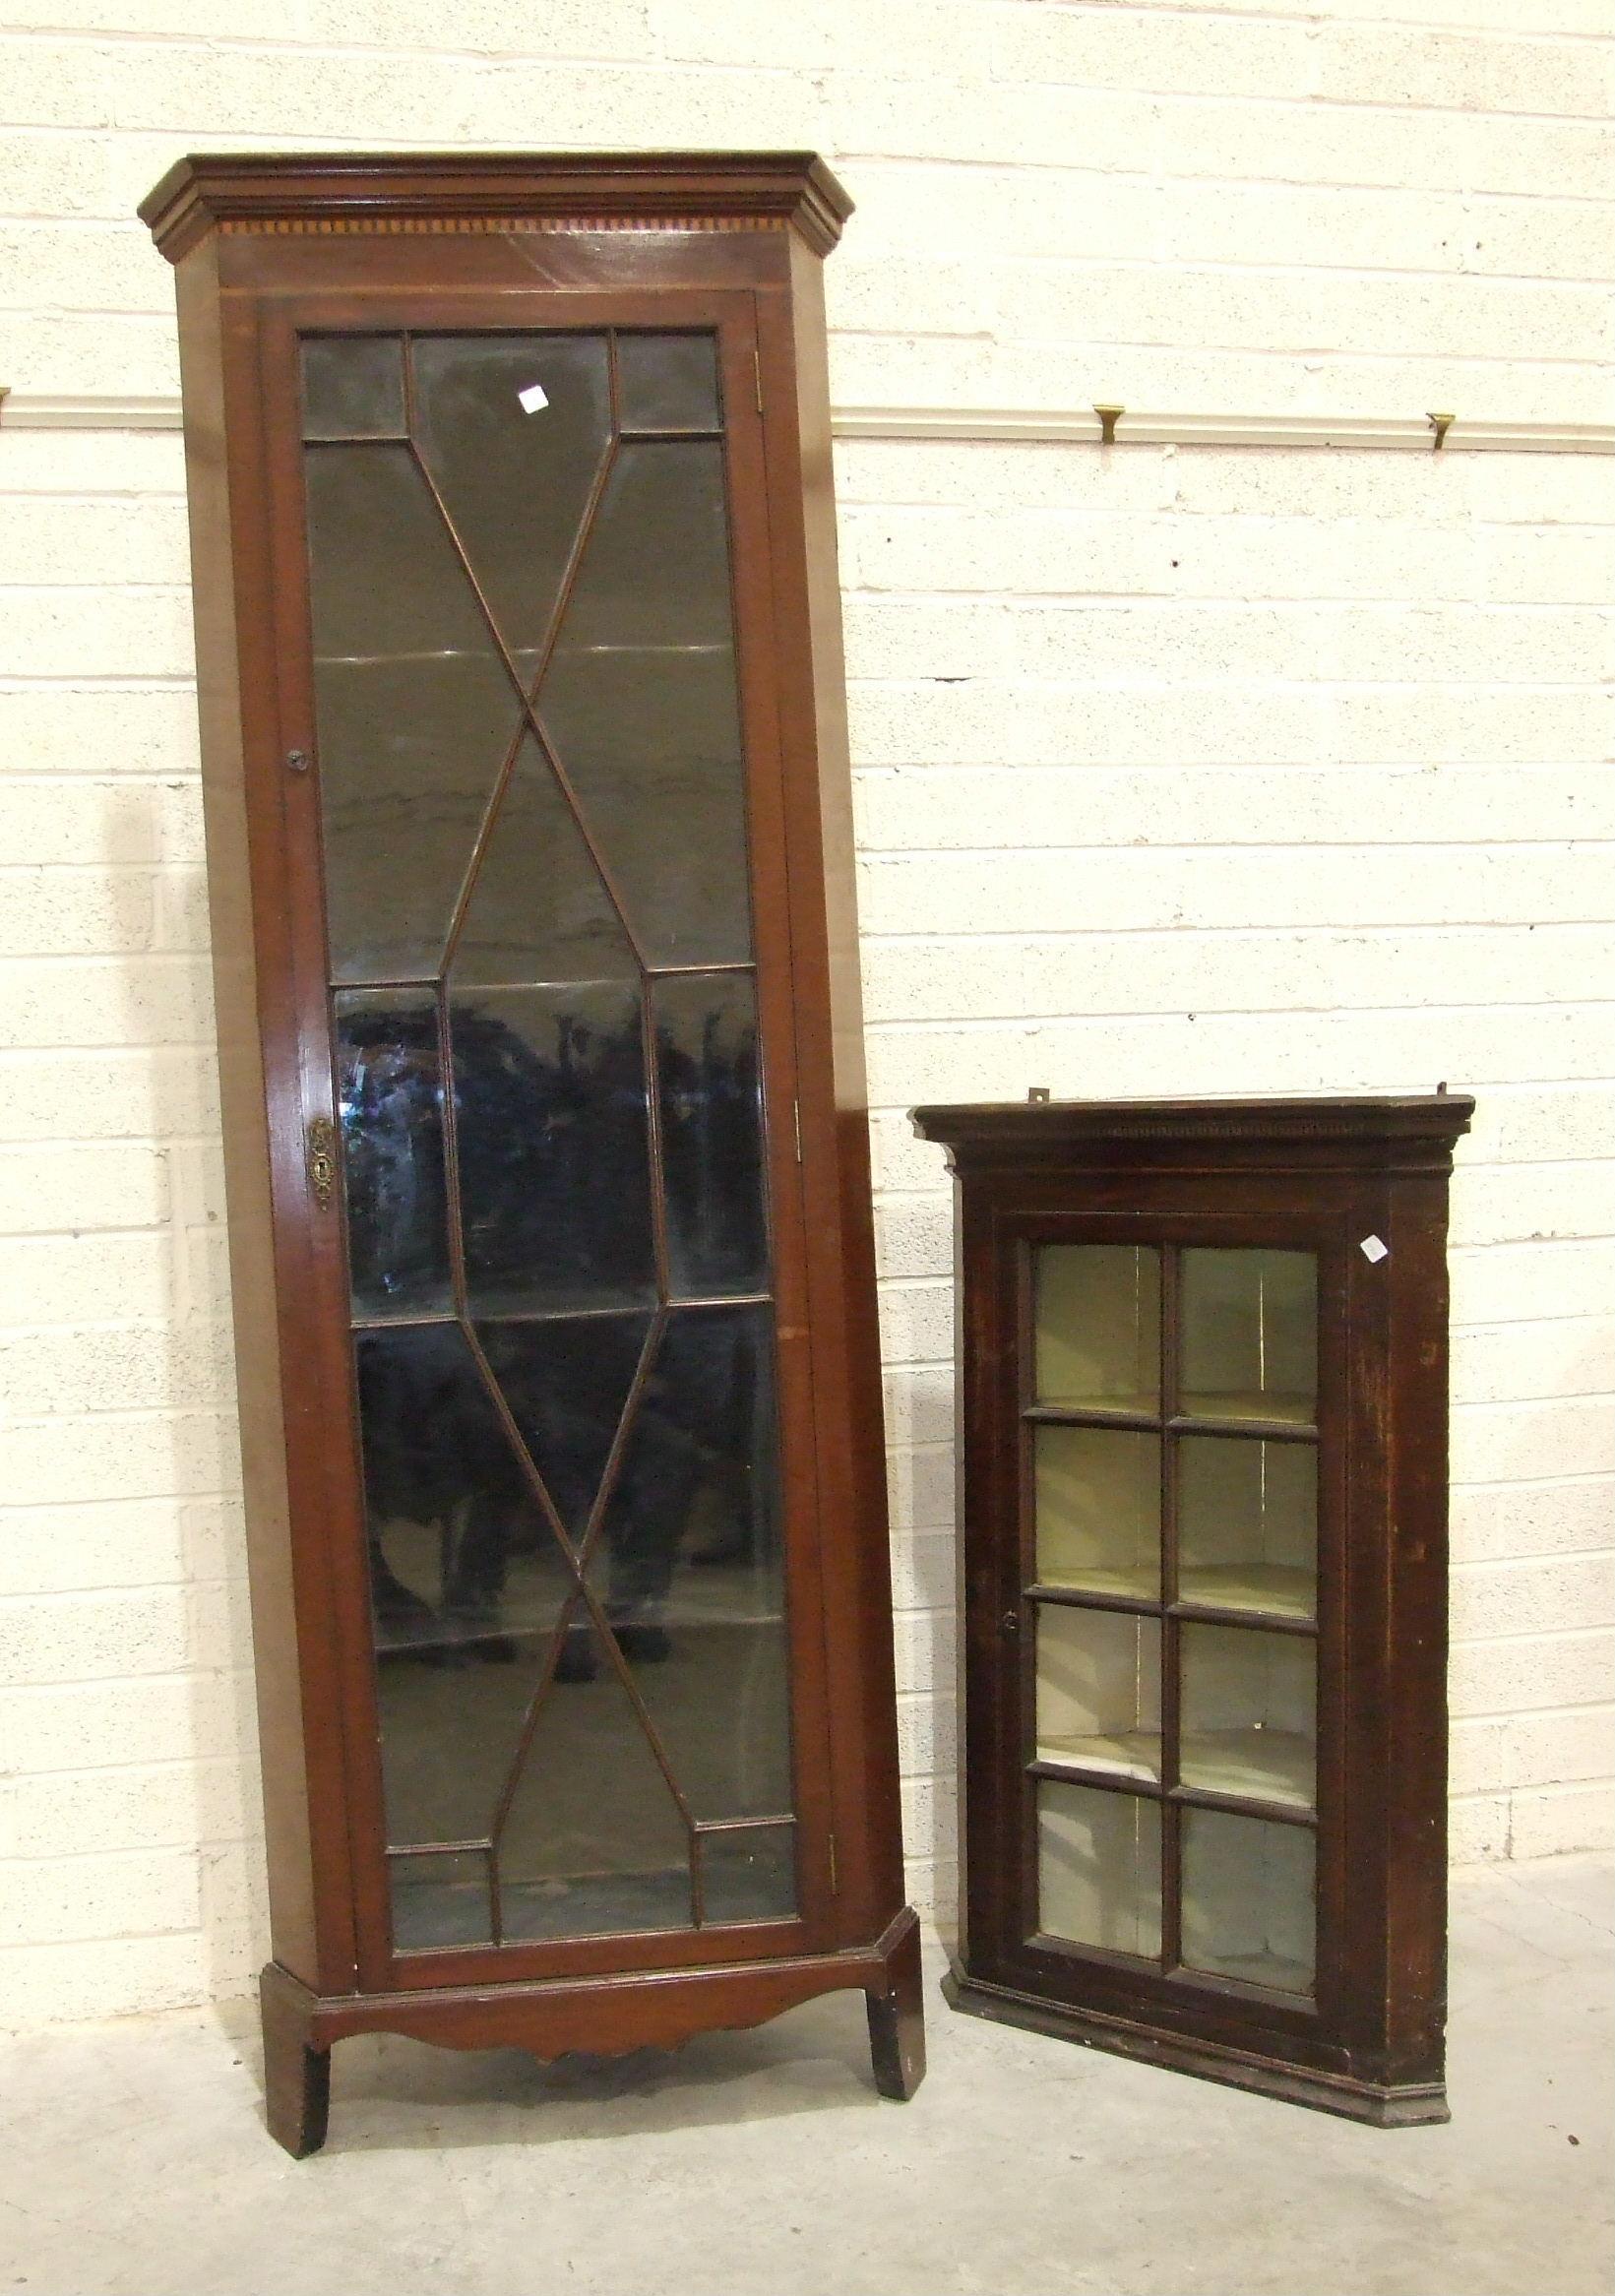 Lot 71 - An Edwardian Georgian-style mahogany tall corner cupboard, the inlaid cornice above an astragal